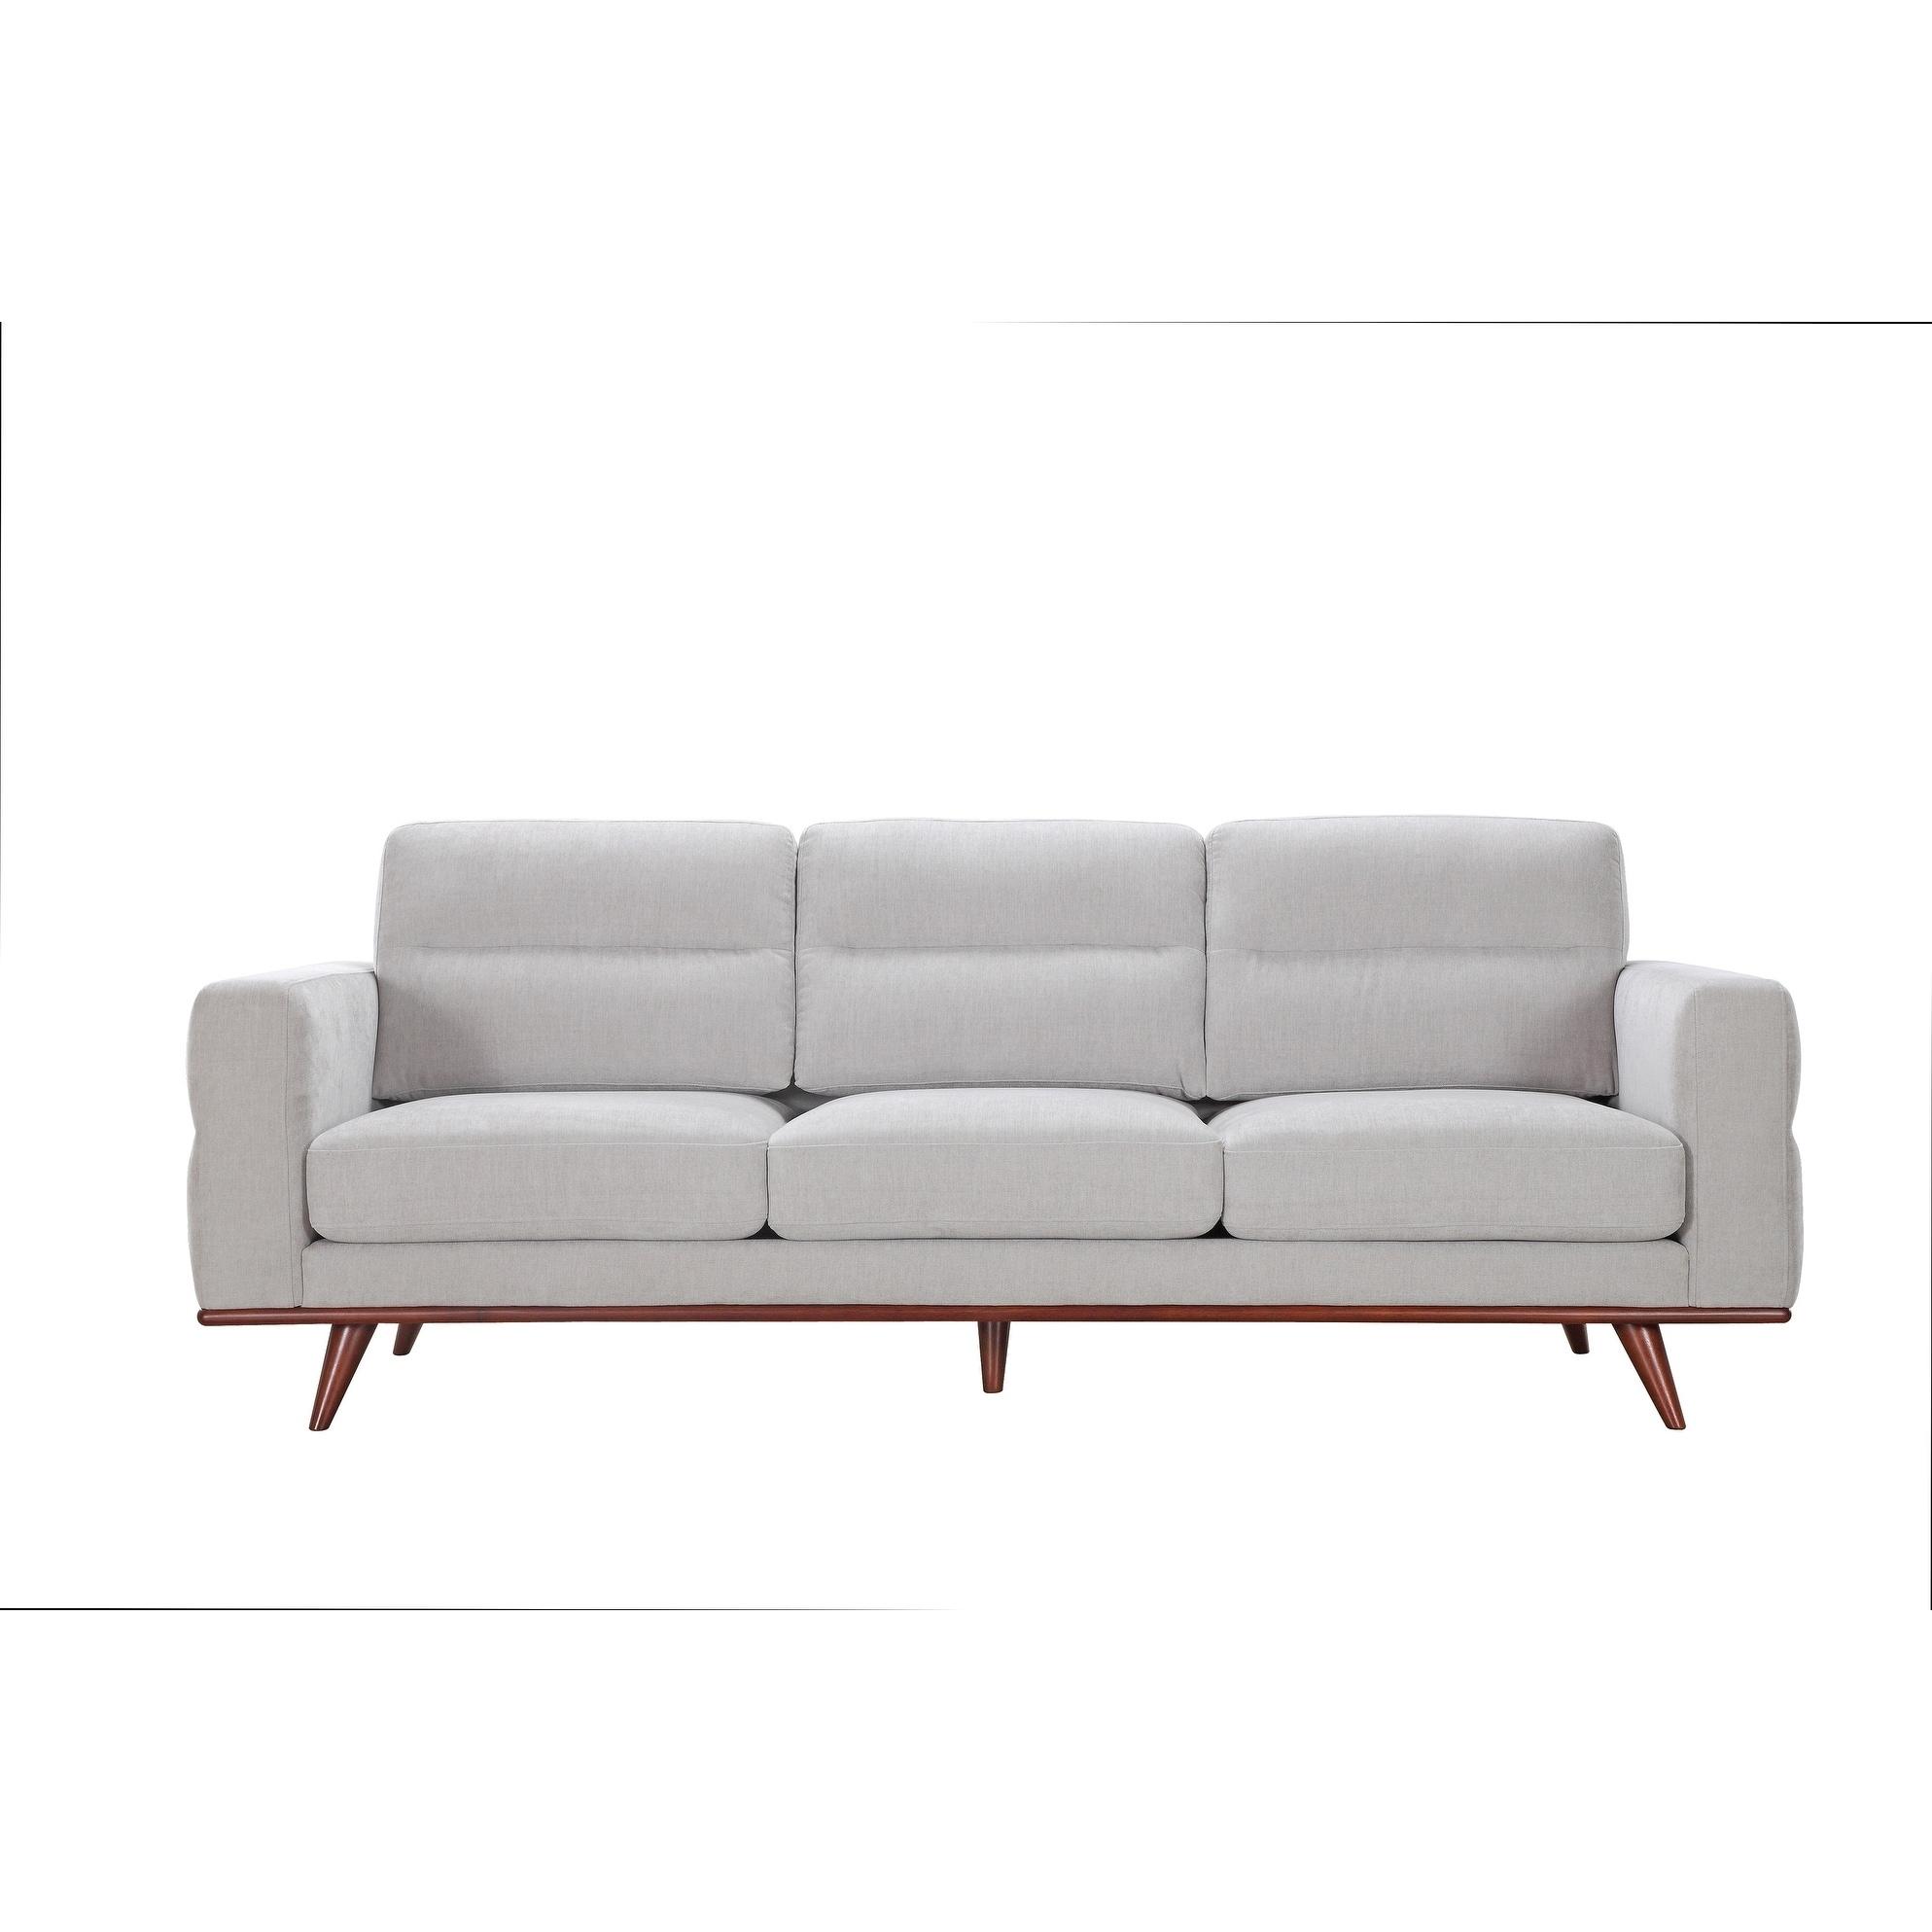 Light Taupe Mid Century Modern Sofa